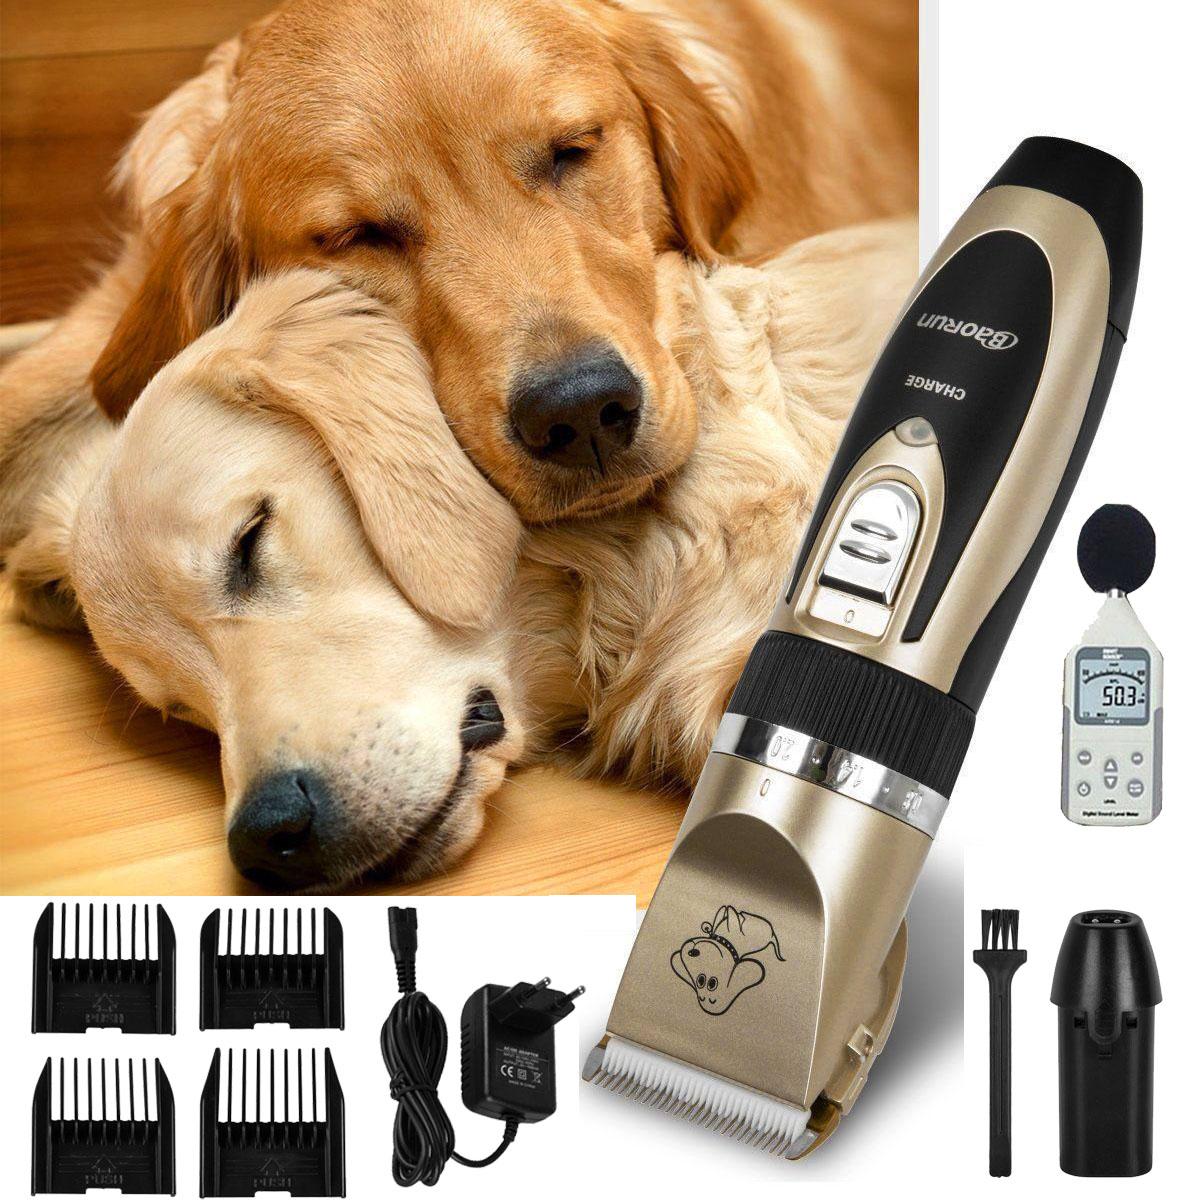 profi tier haarschneider hunde katze akku keramik schermaschine rasierer trimmer ebay. Black Bedroom Furniture Sets. Home Design Ideas